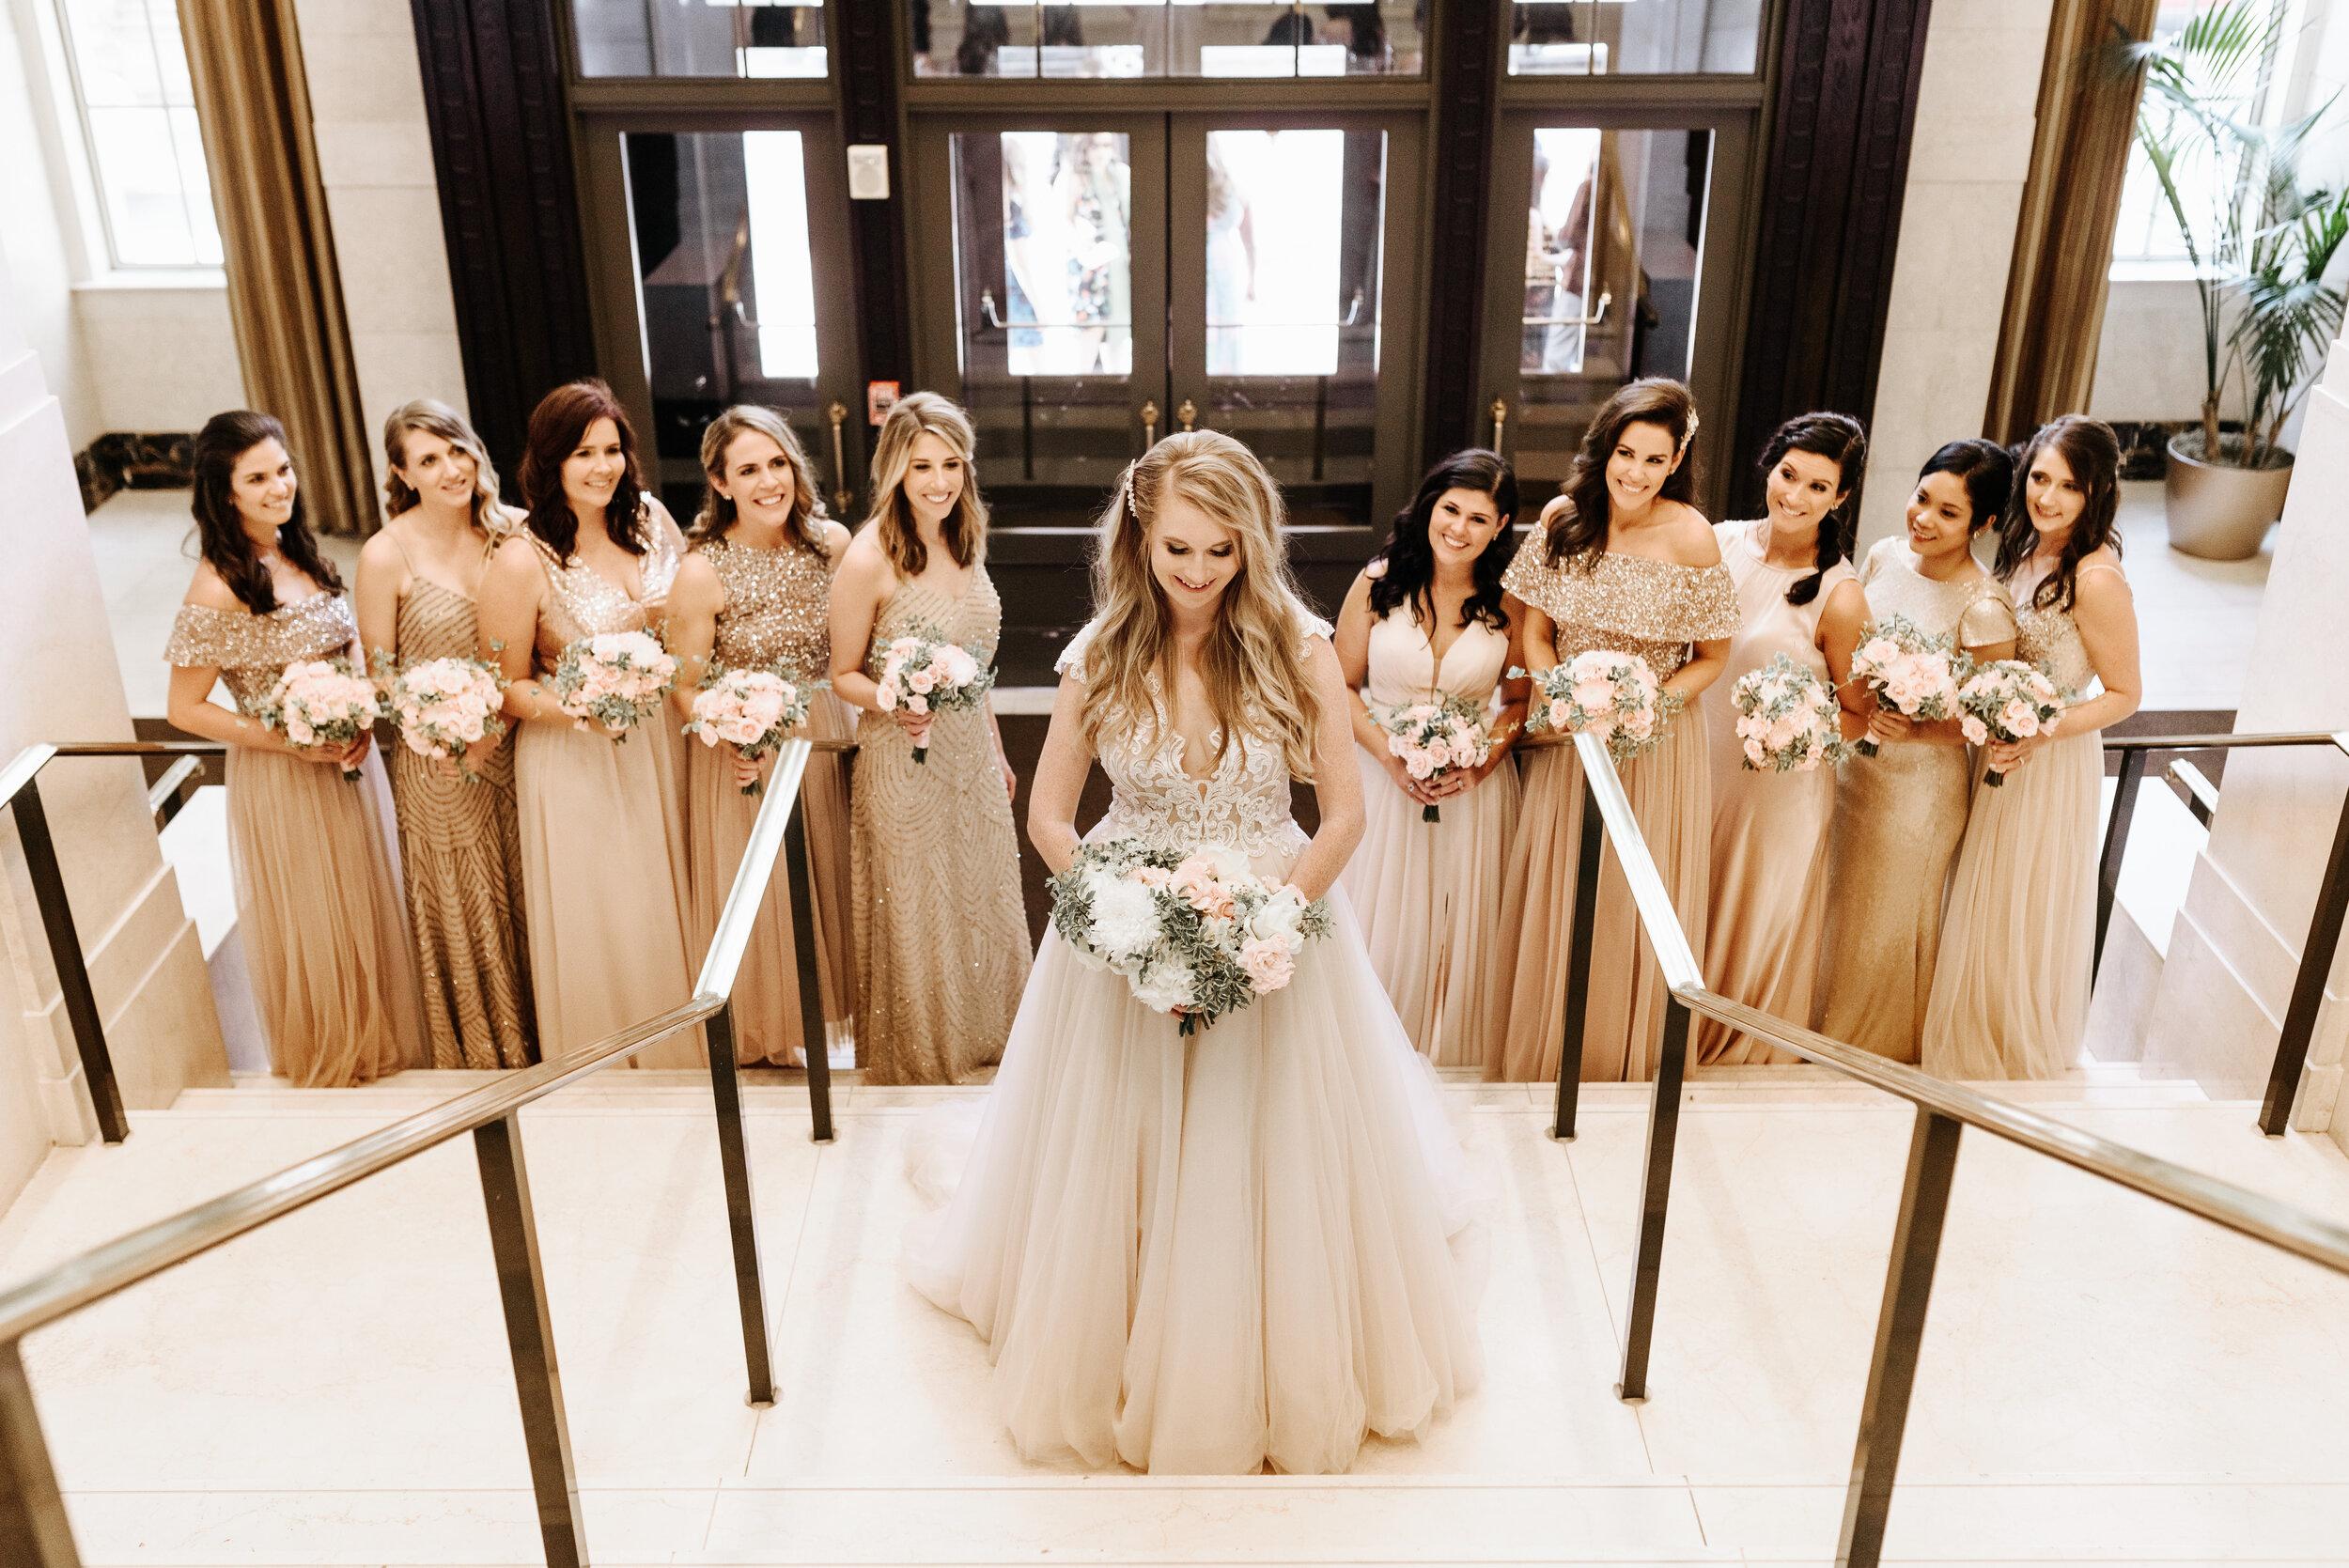 Cassie-Mrunal-Wedding-Quirk-Hotel-John-Marshall-Ballrooms-Richmond-Virginia-Photography-by-V-59.jpg